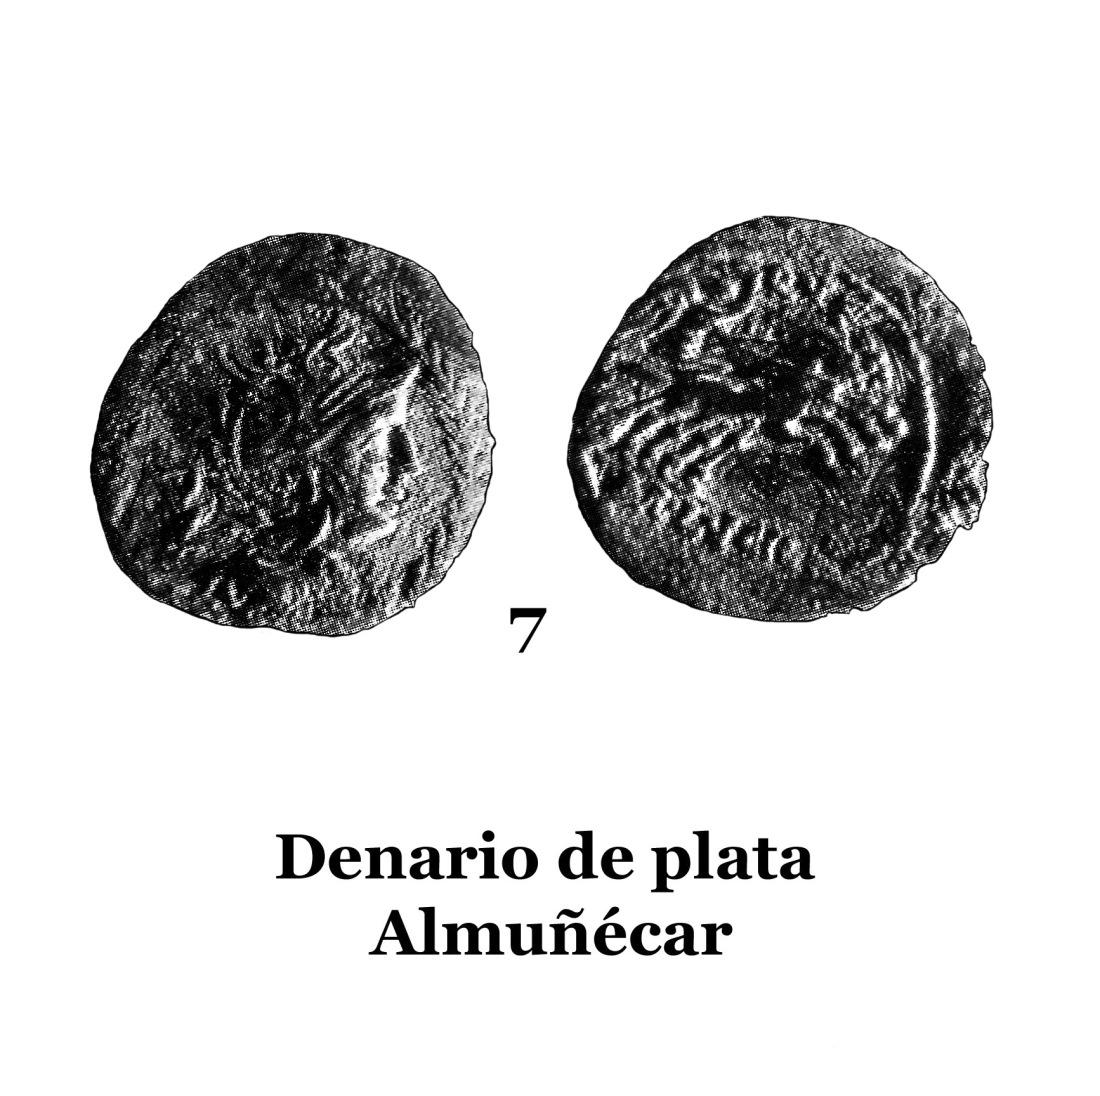 7Denario de plata de Almuñécar 7